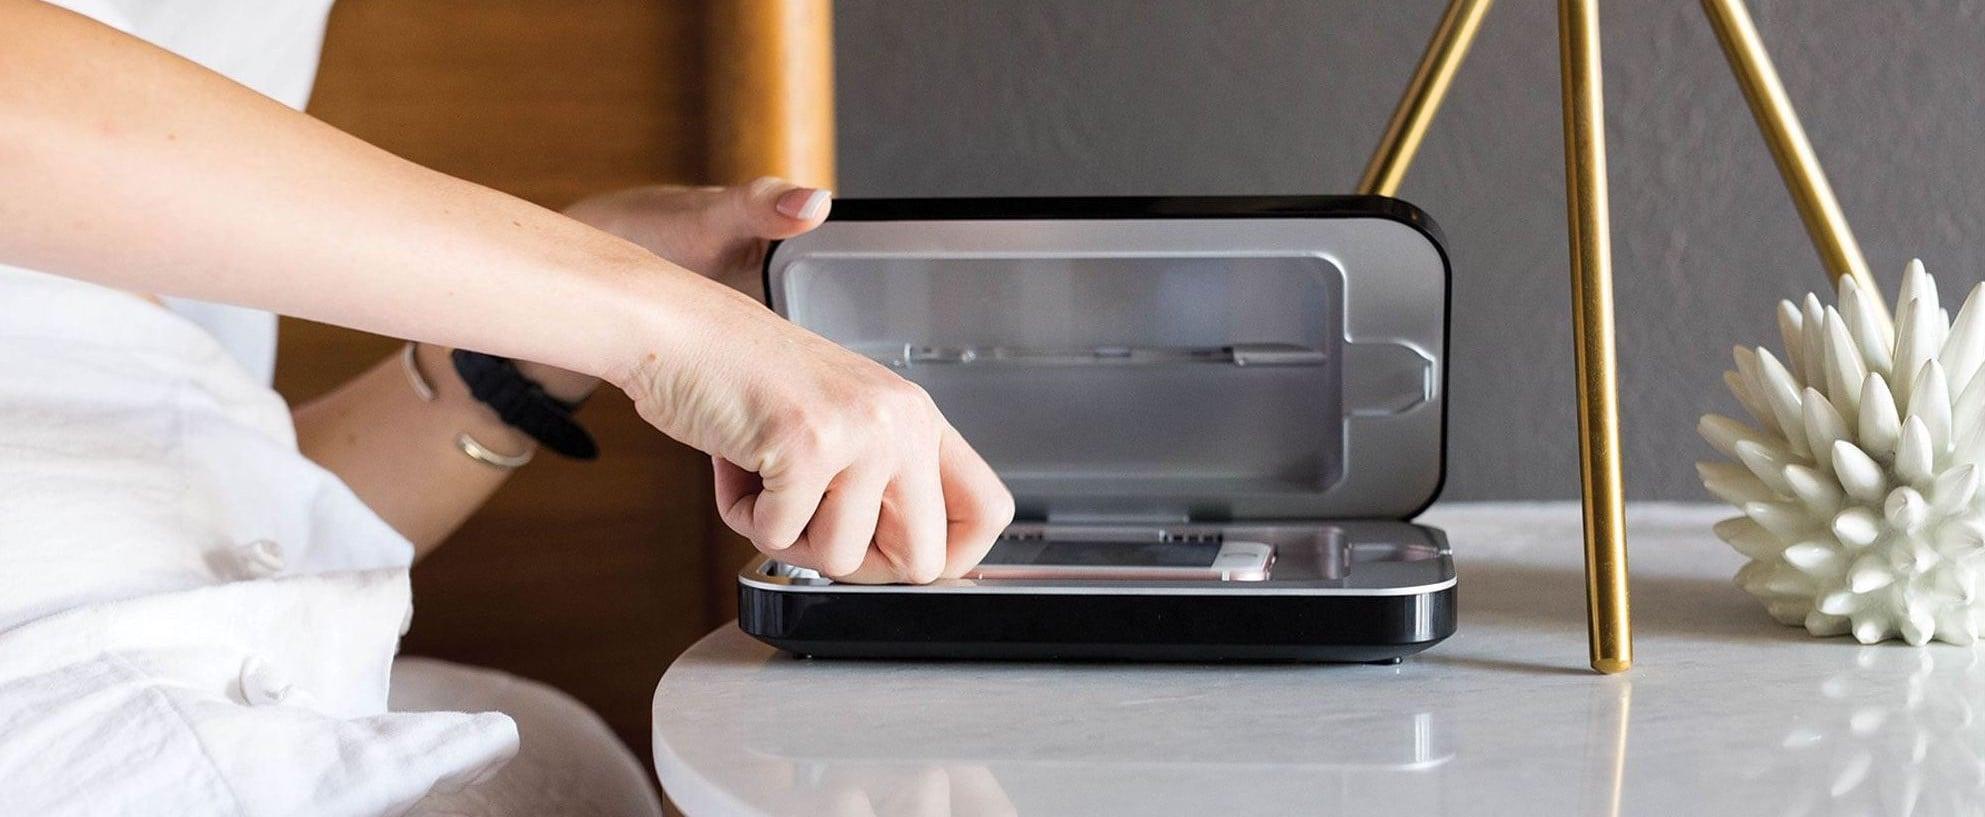 Best UV Light Phone Cleaner on Amazon